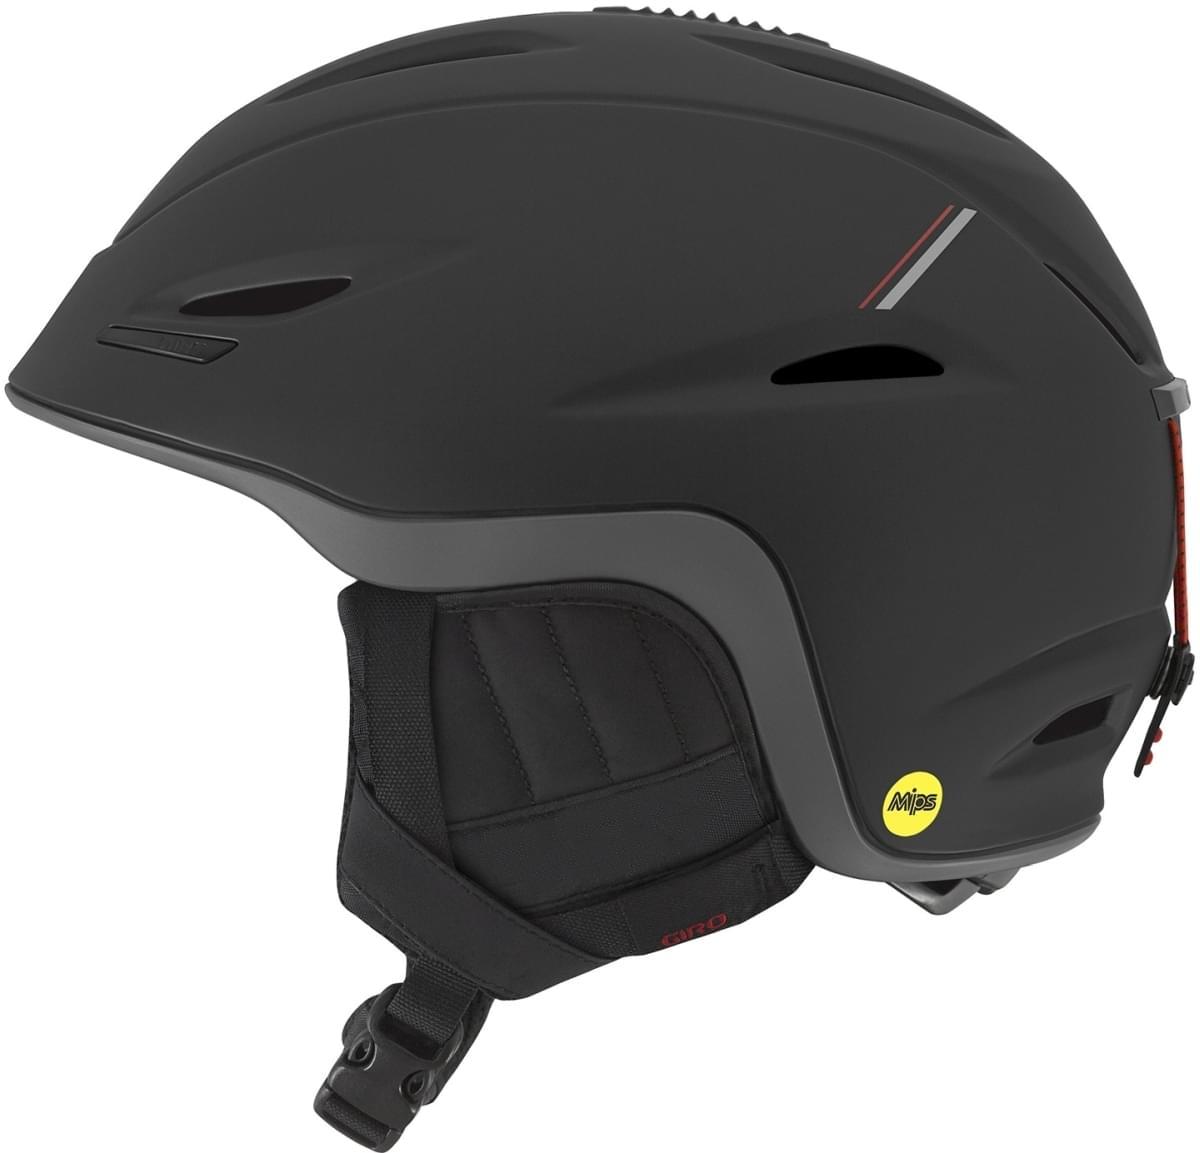 Giro Union MIPS Mat Black/Red Sport Tech M